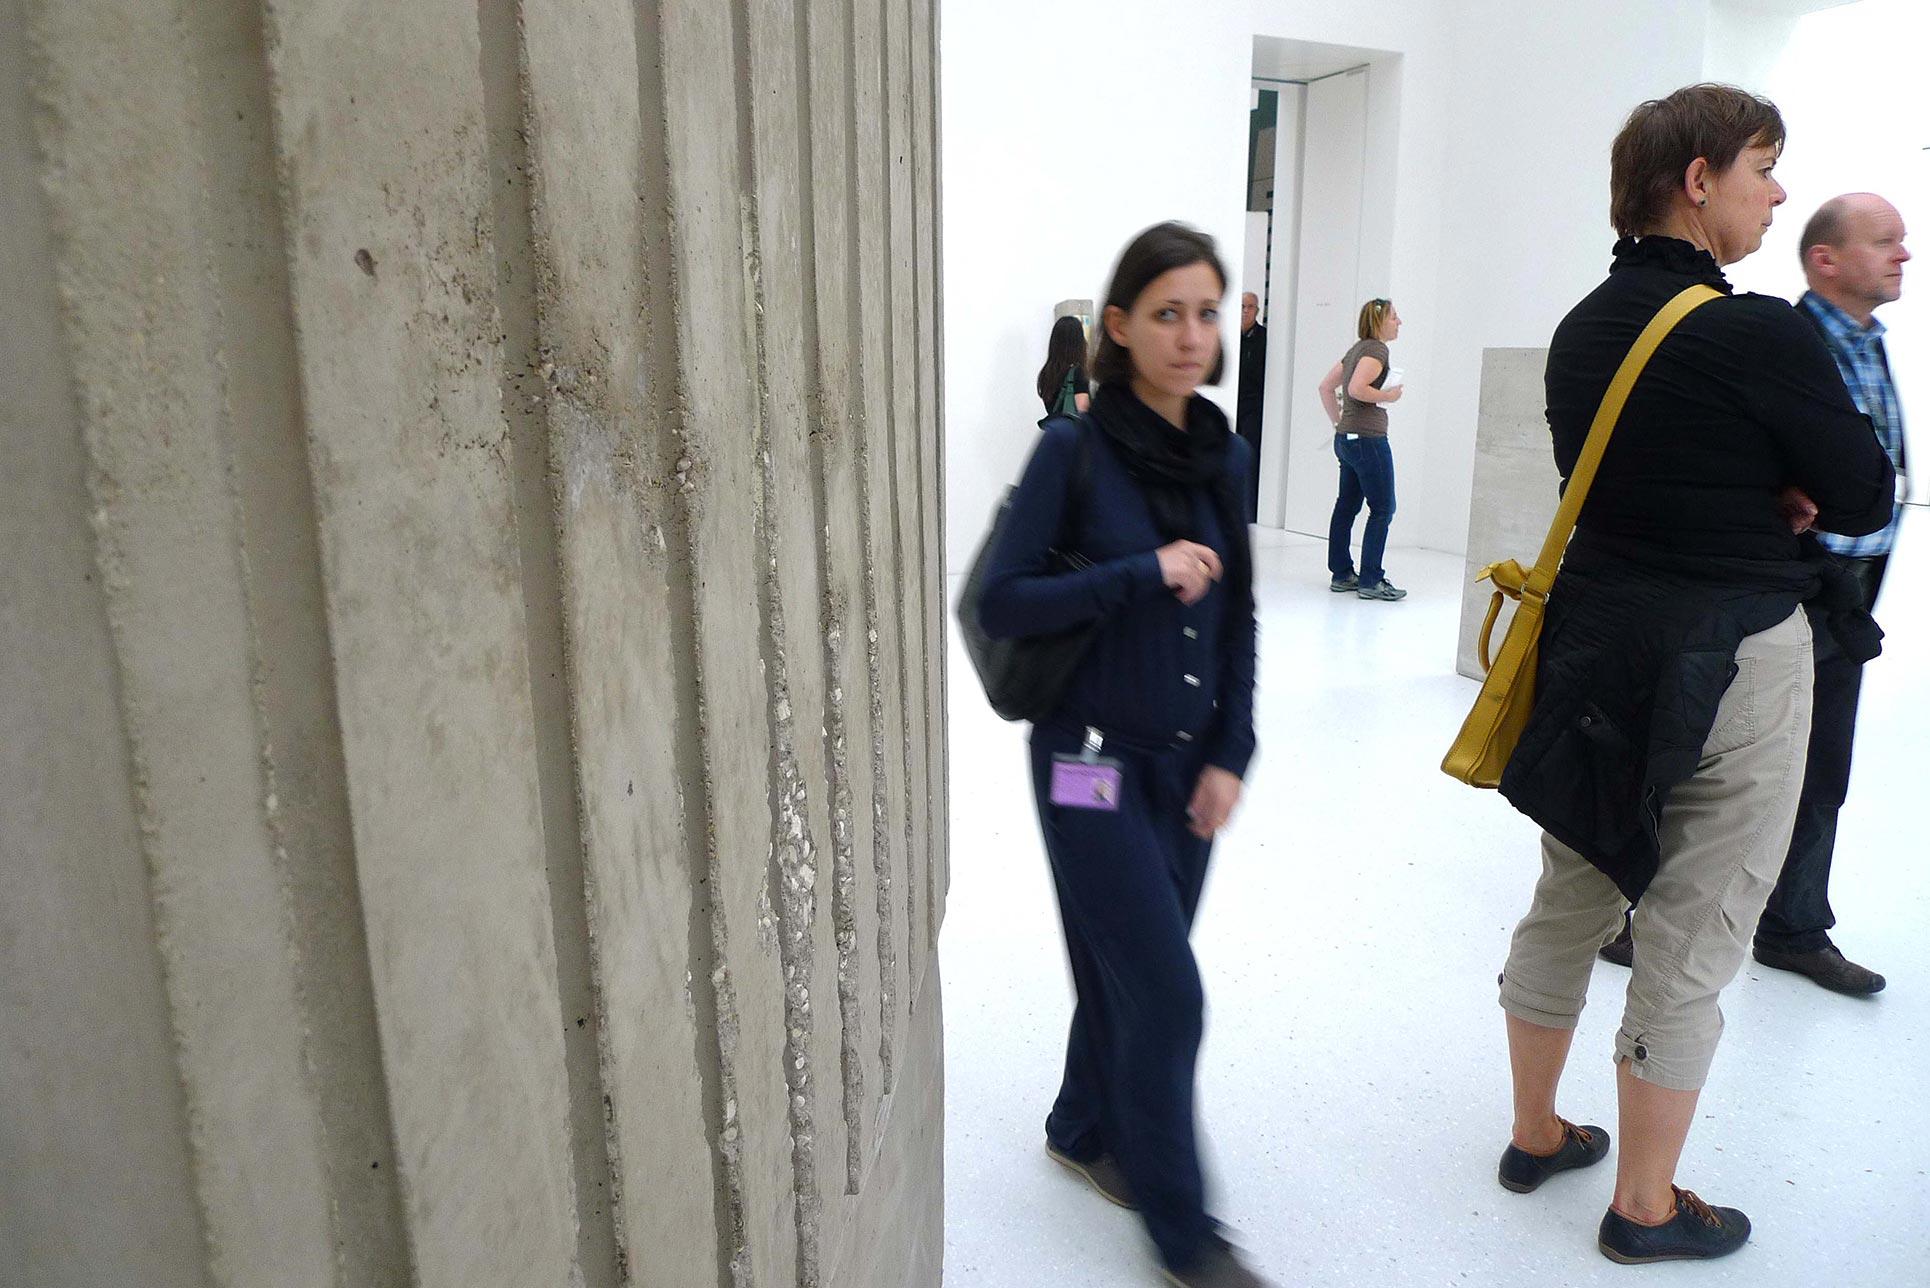 Rossella Biscotti appears behind her work The Process, 2010-2012, (Photo: Barbara Fässler)